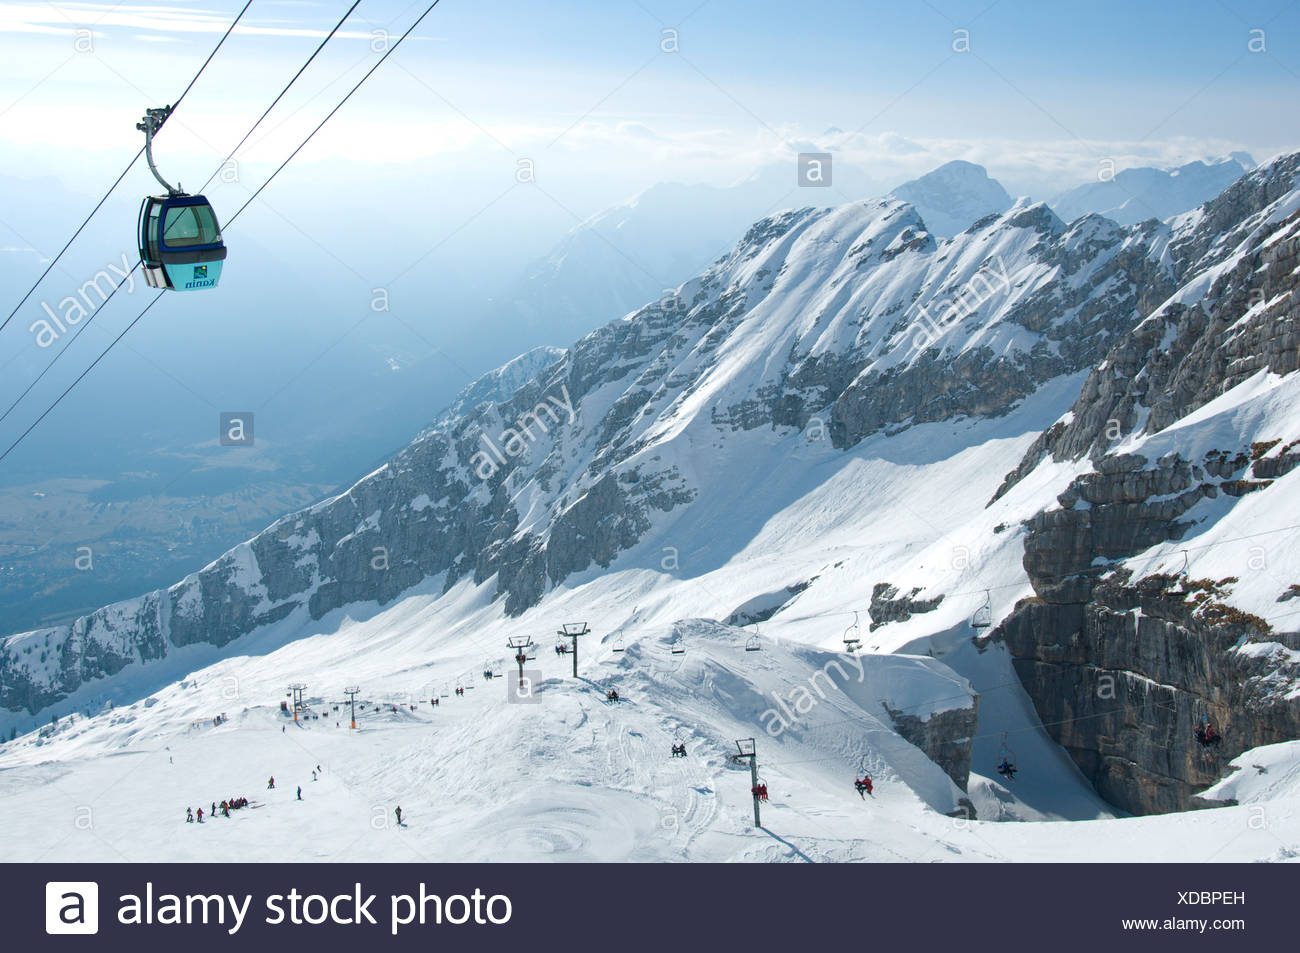 kanin ski area near bovec, slovenia shows a gondola and distant